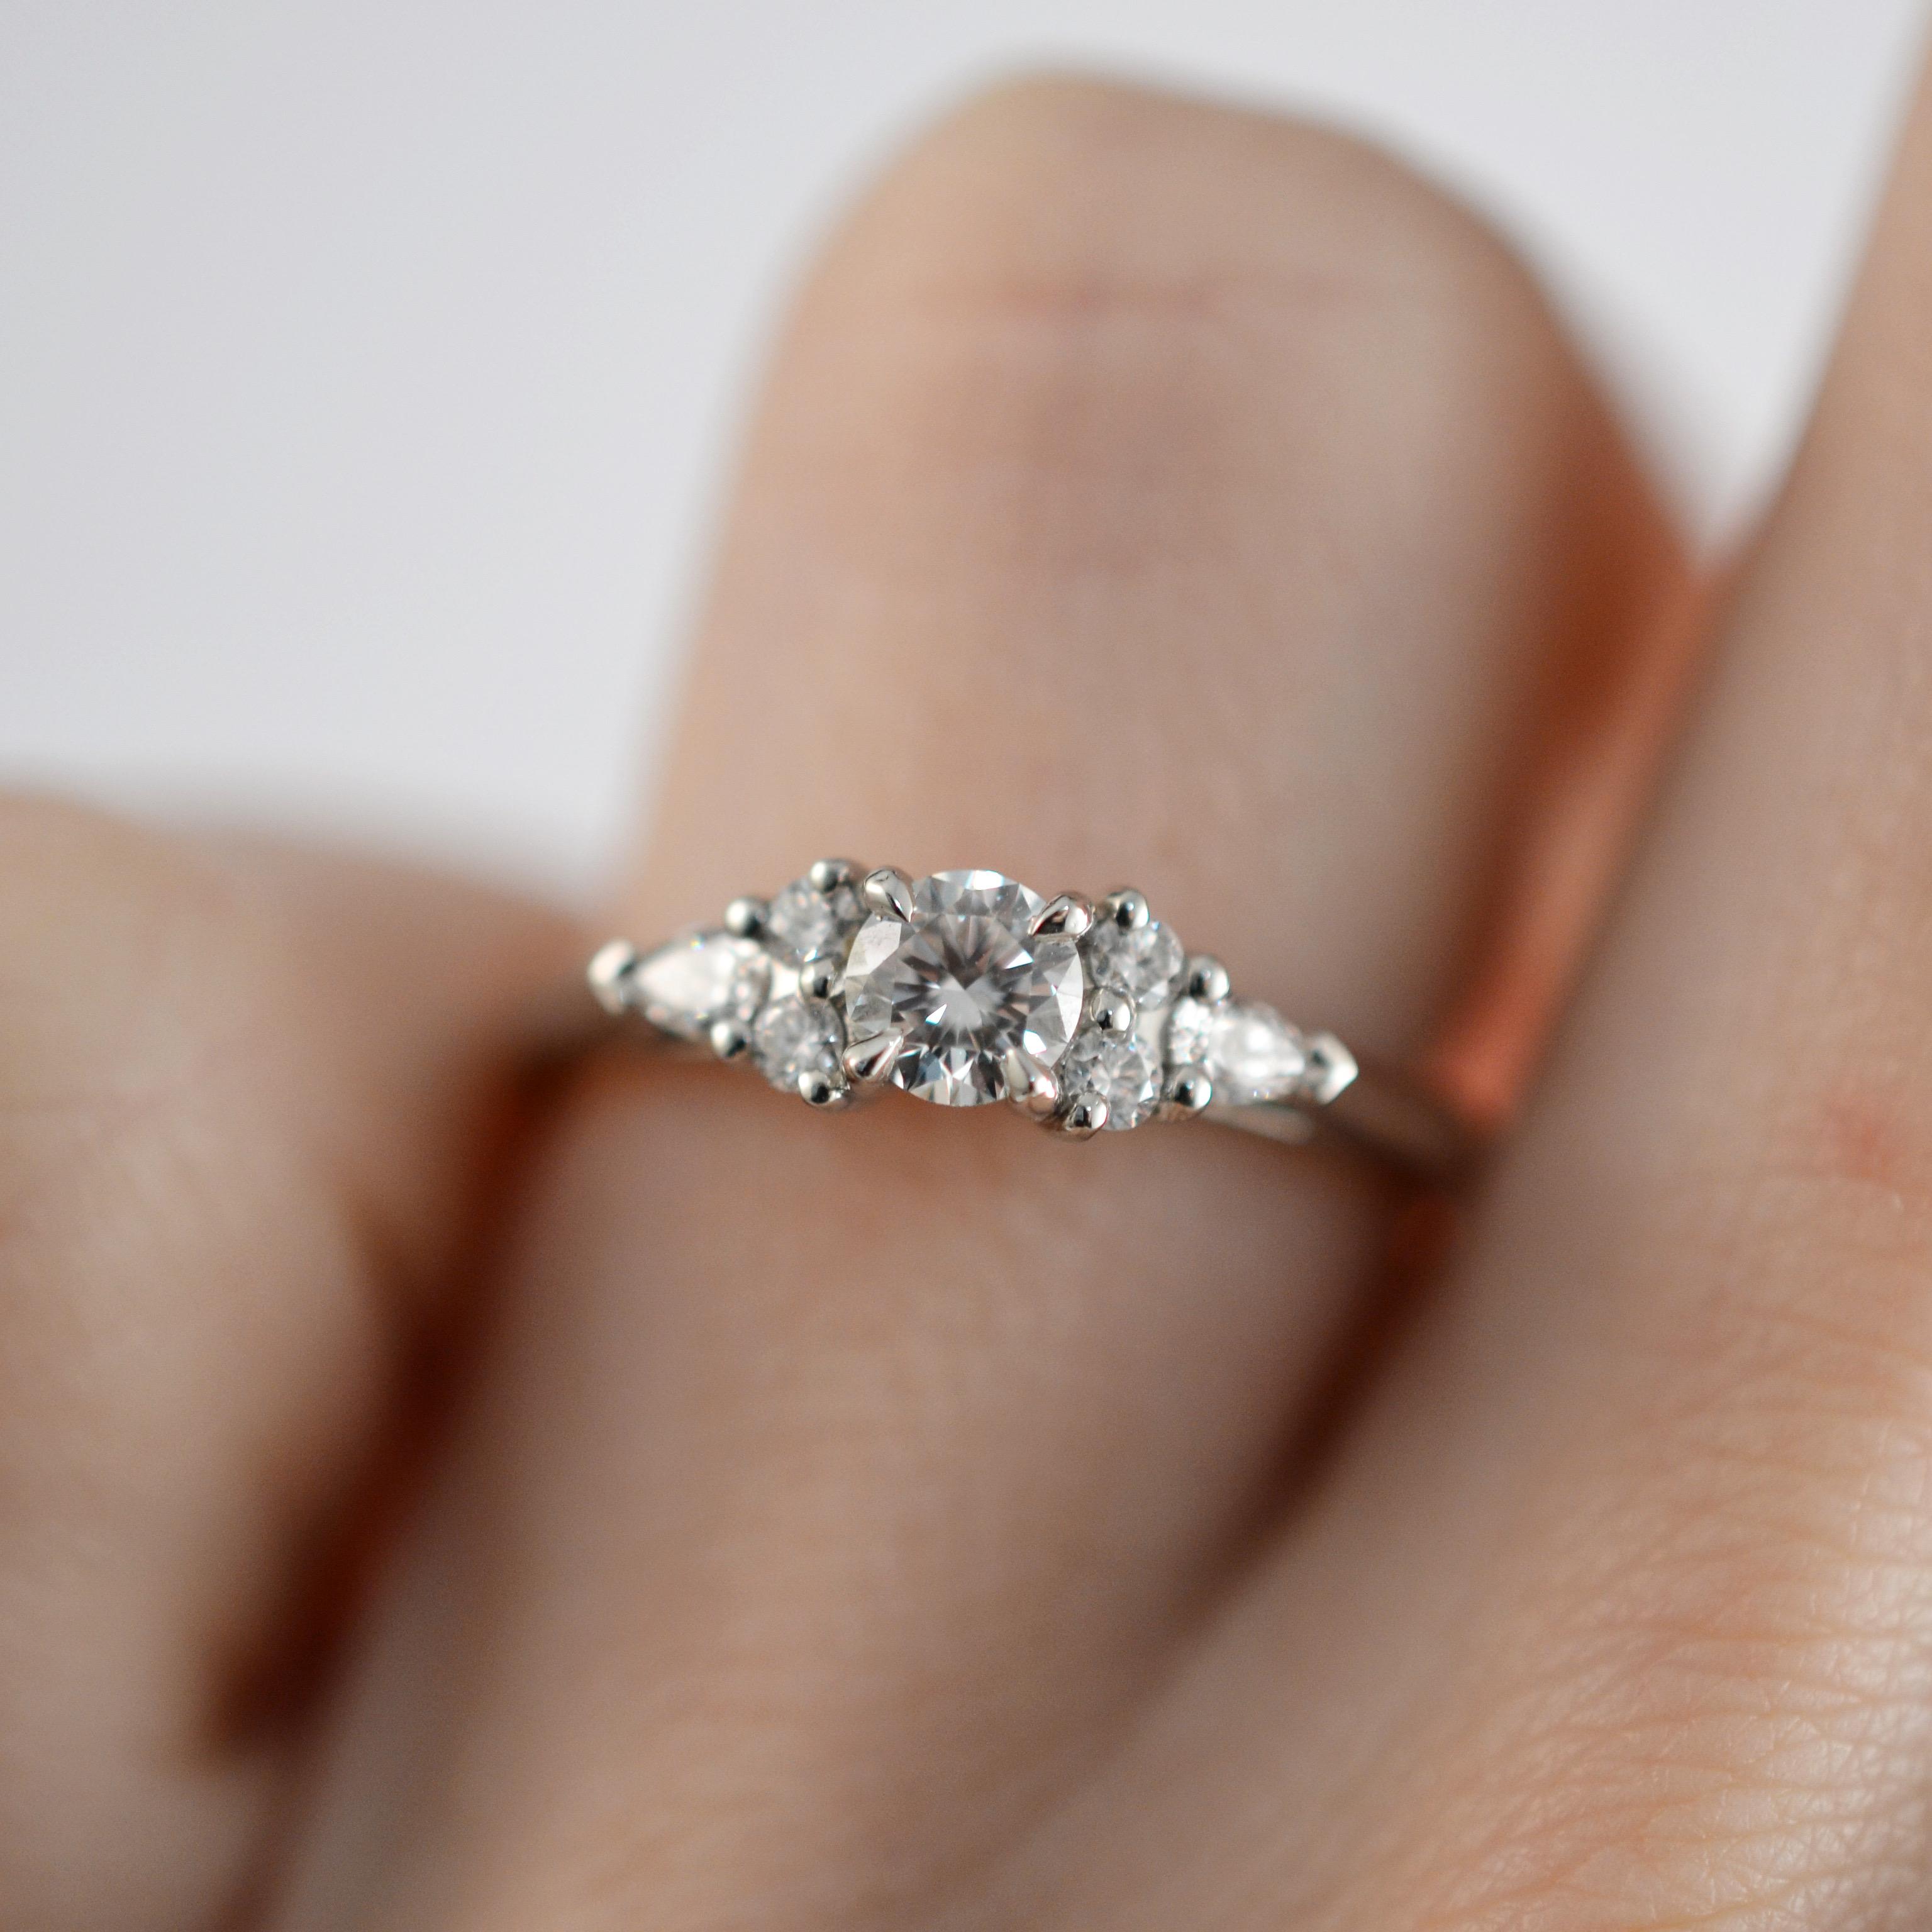 Bespoke Platinum 0.50ct Canadian Diamond Engagement Ring